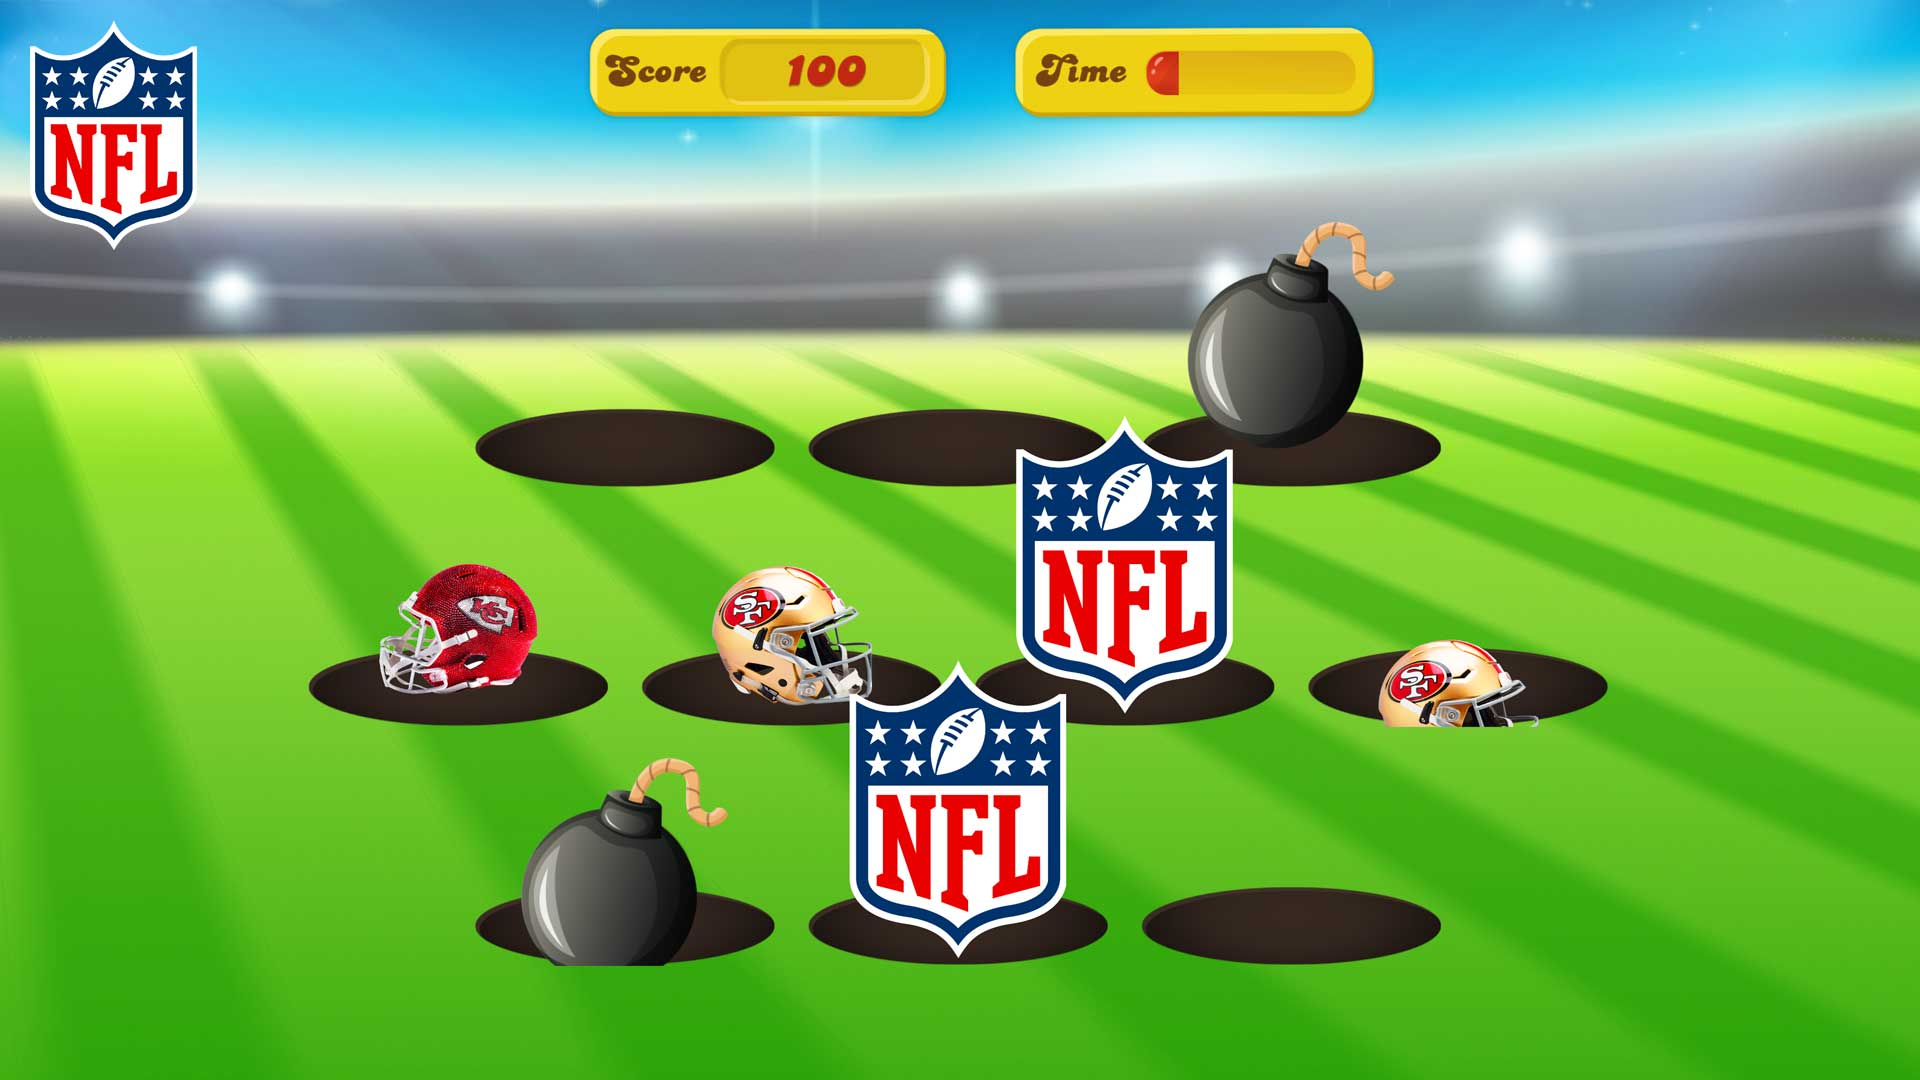 NFL Theme Whack a Mole